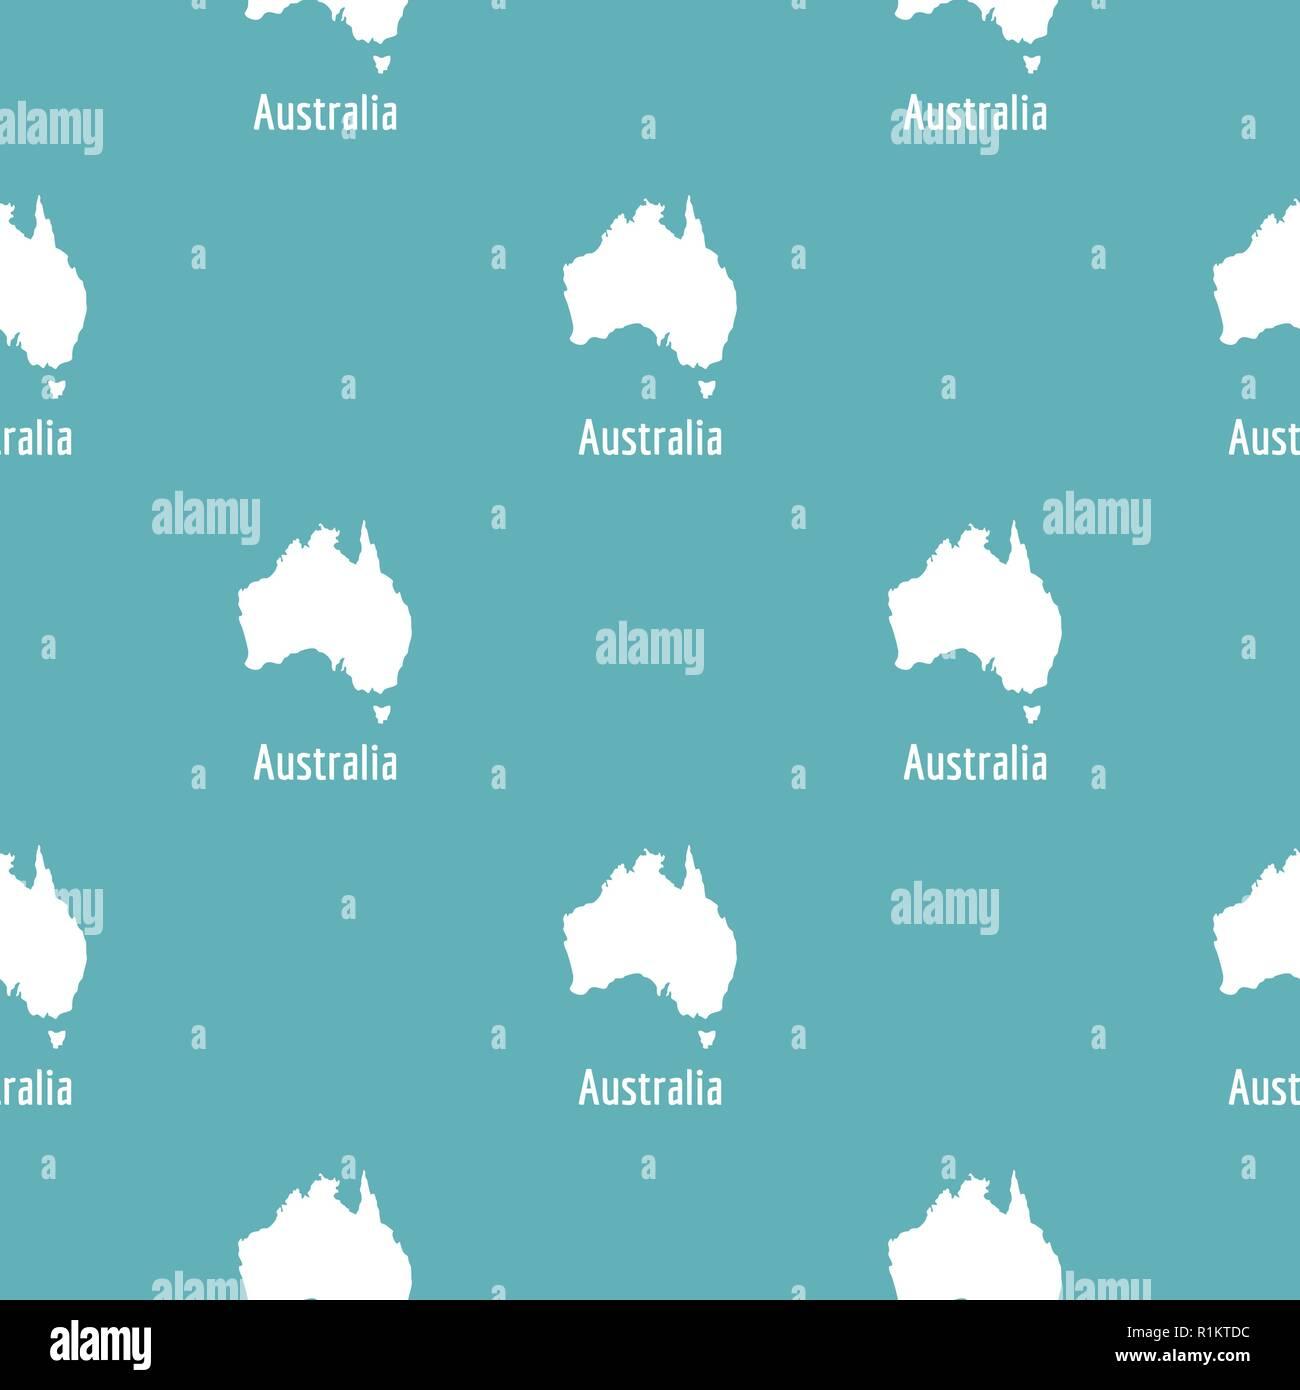 Australia Map Simple.Australia Map In Black Simple Illustration Of Australia Map Vector